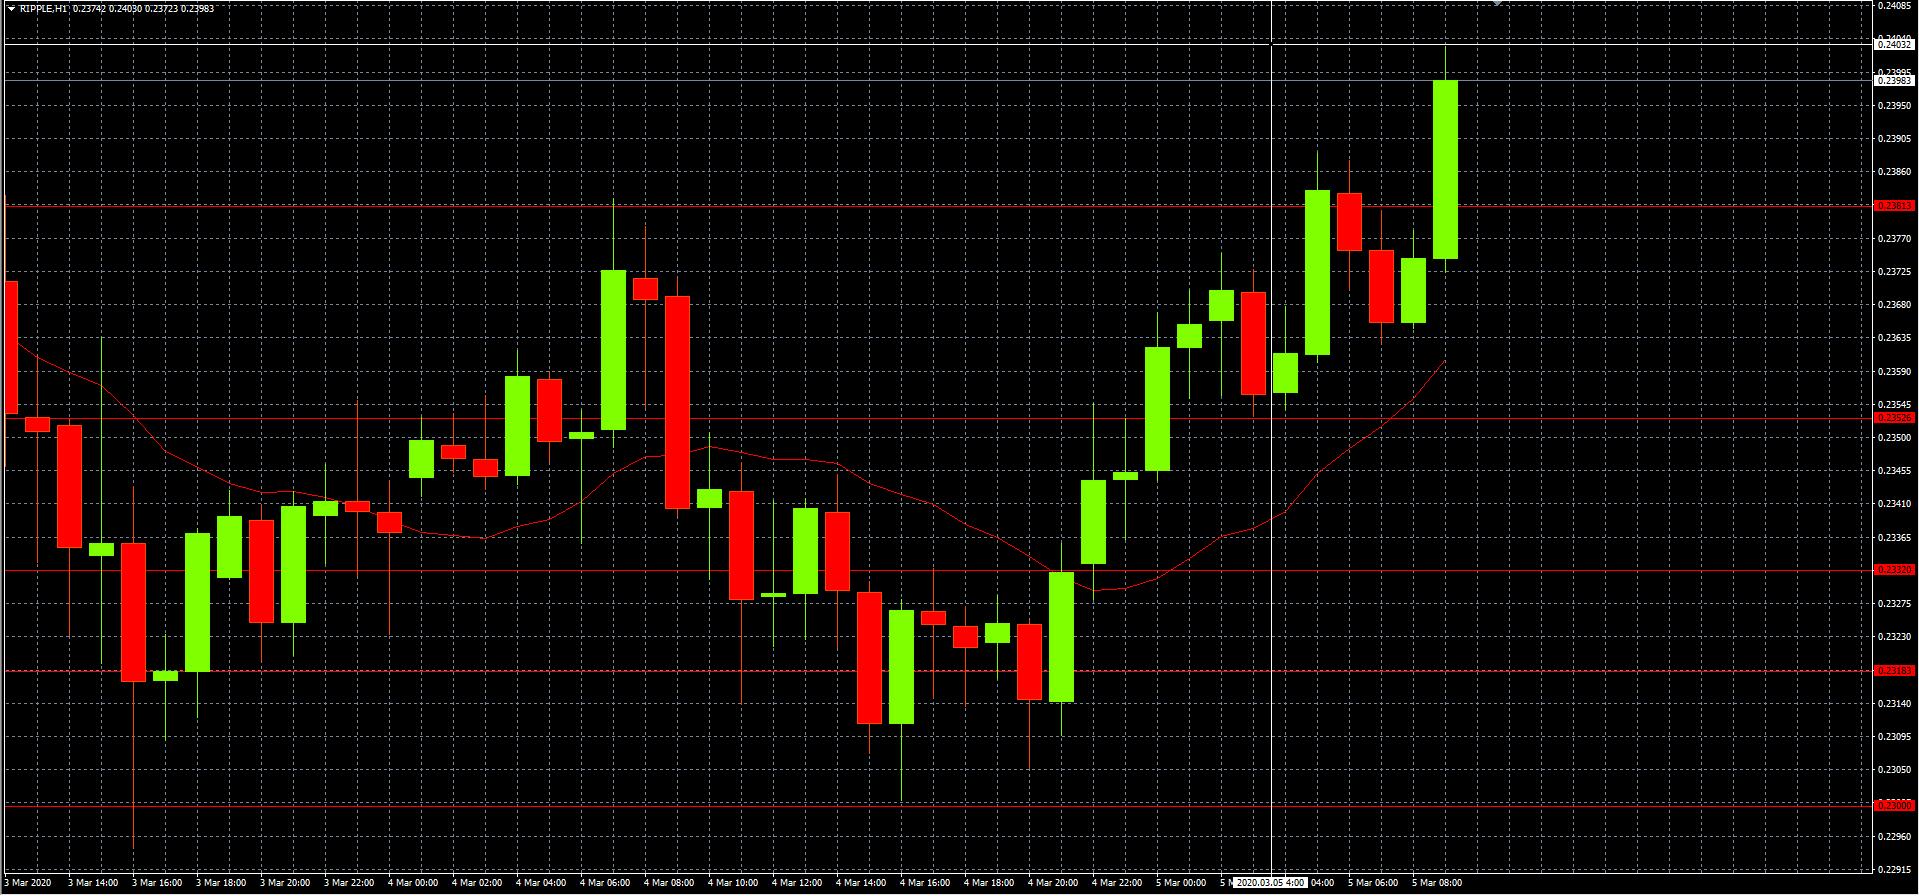 Обзор рынка на 05.03.2020